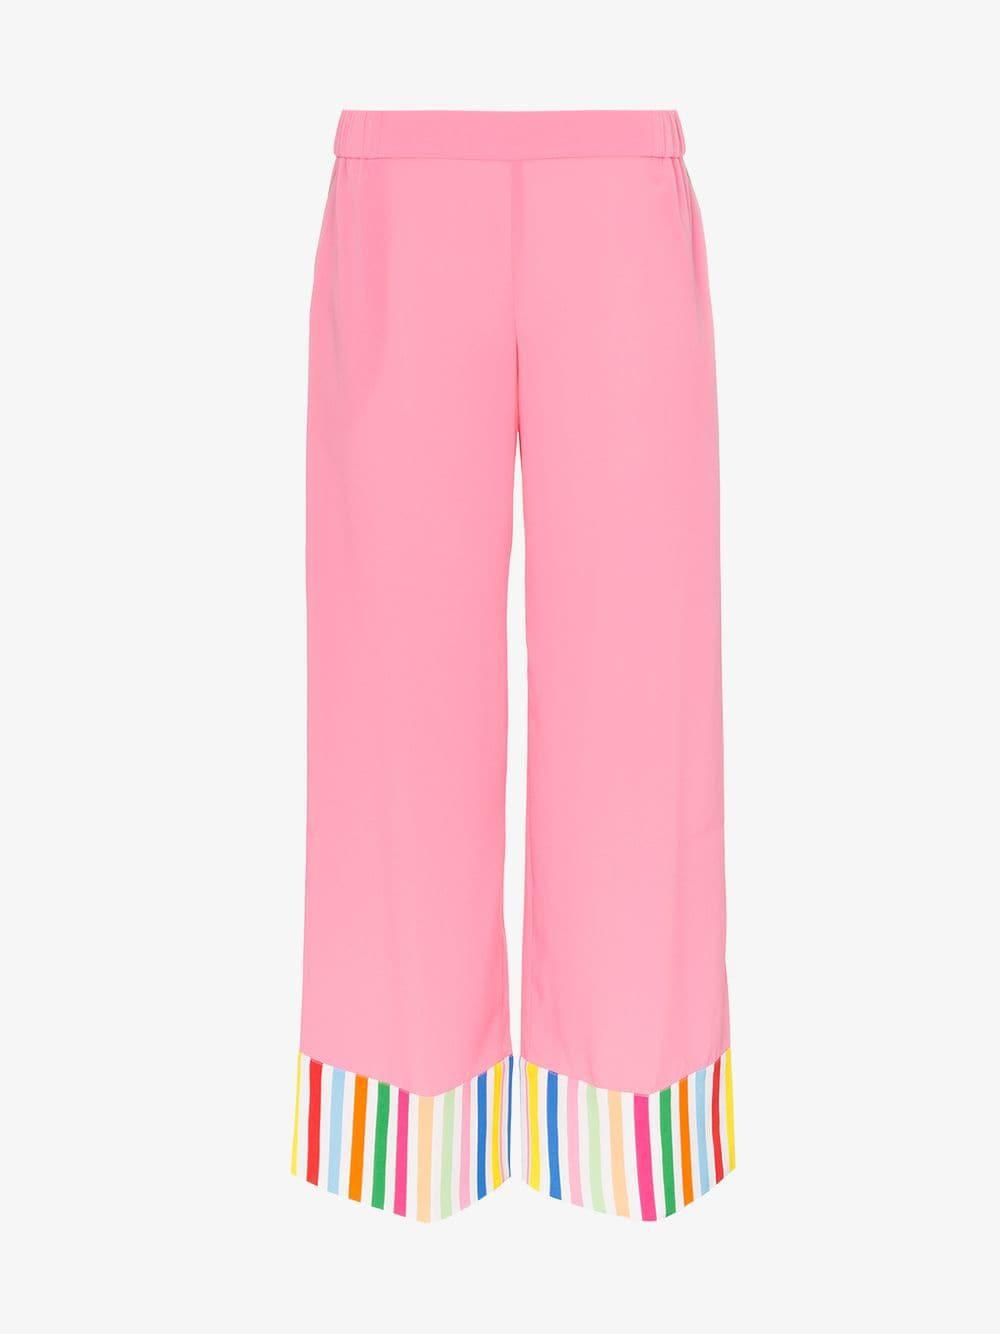 Mira Mikati contrast stripe wide leg trousers in pink